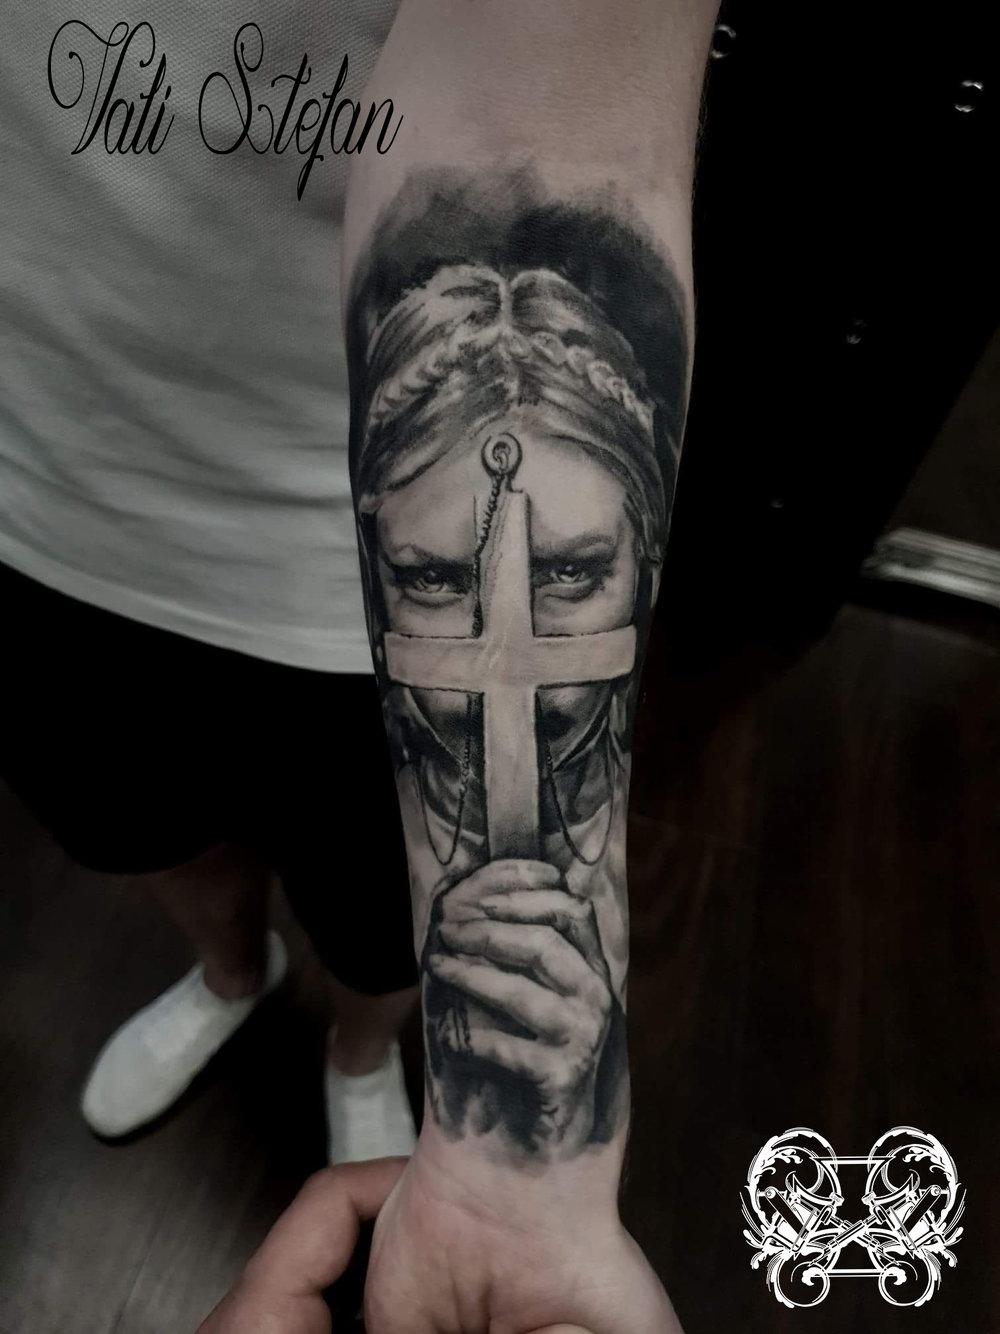 Vali woman crucifix.jpg